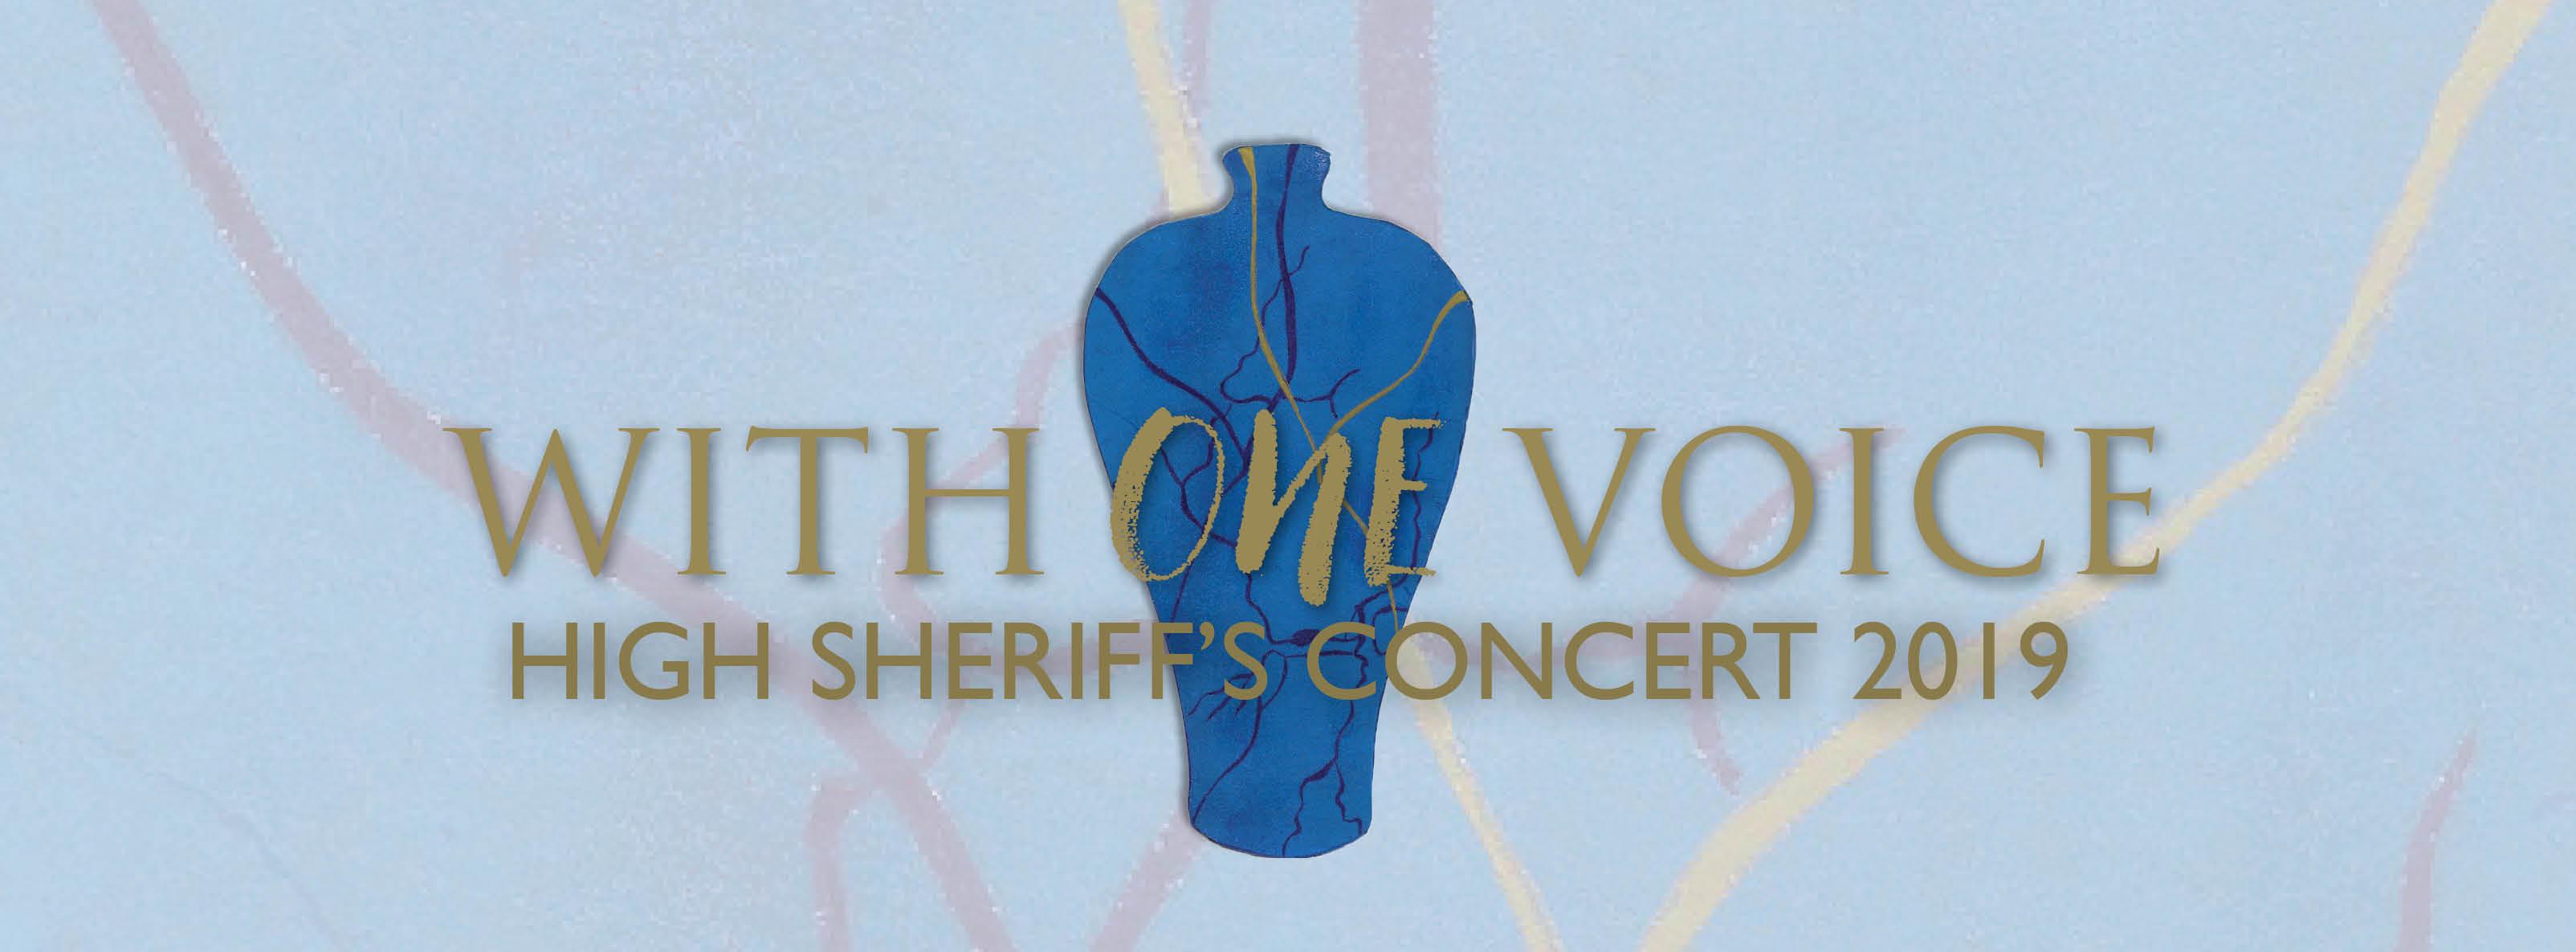 High Sheriff Concert 2019